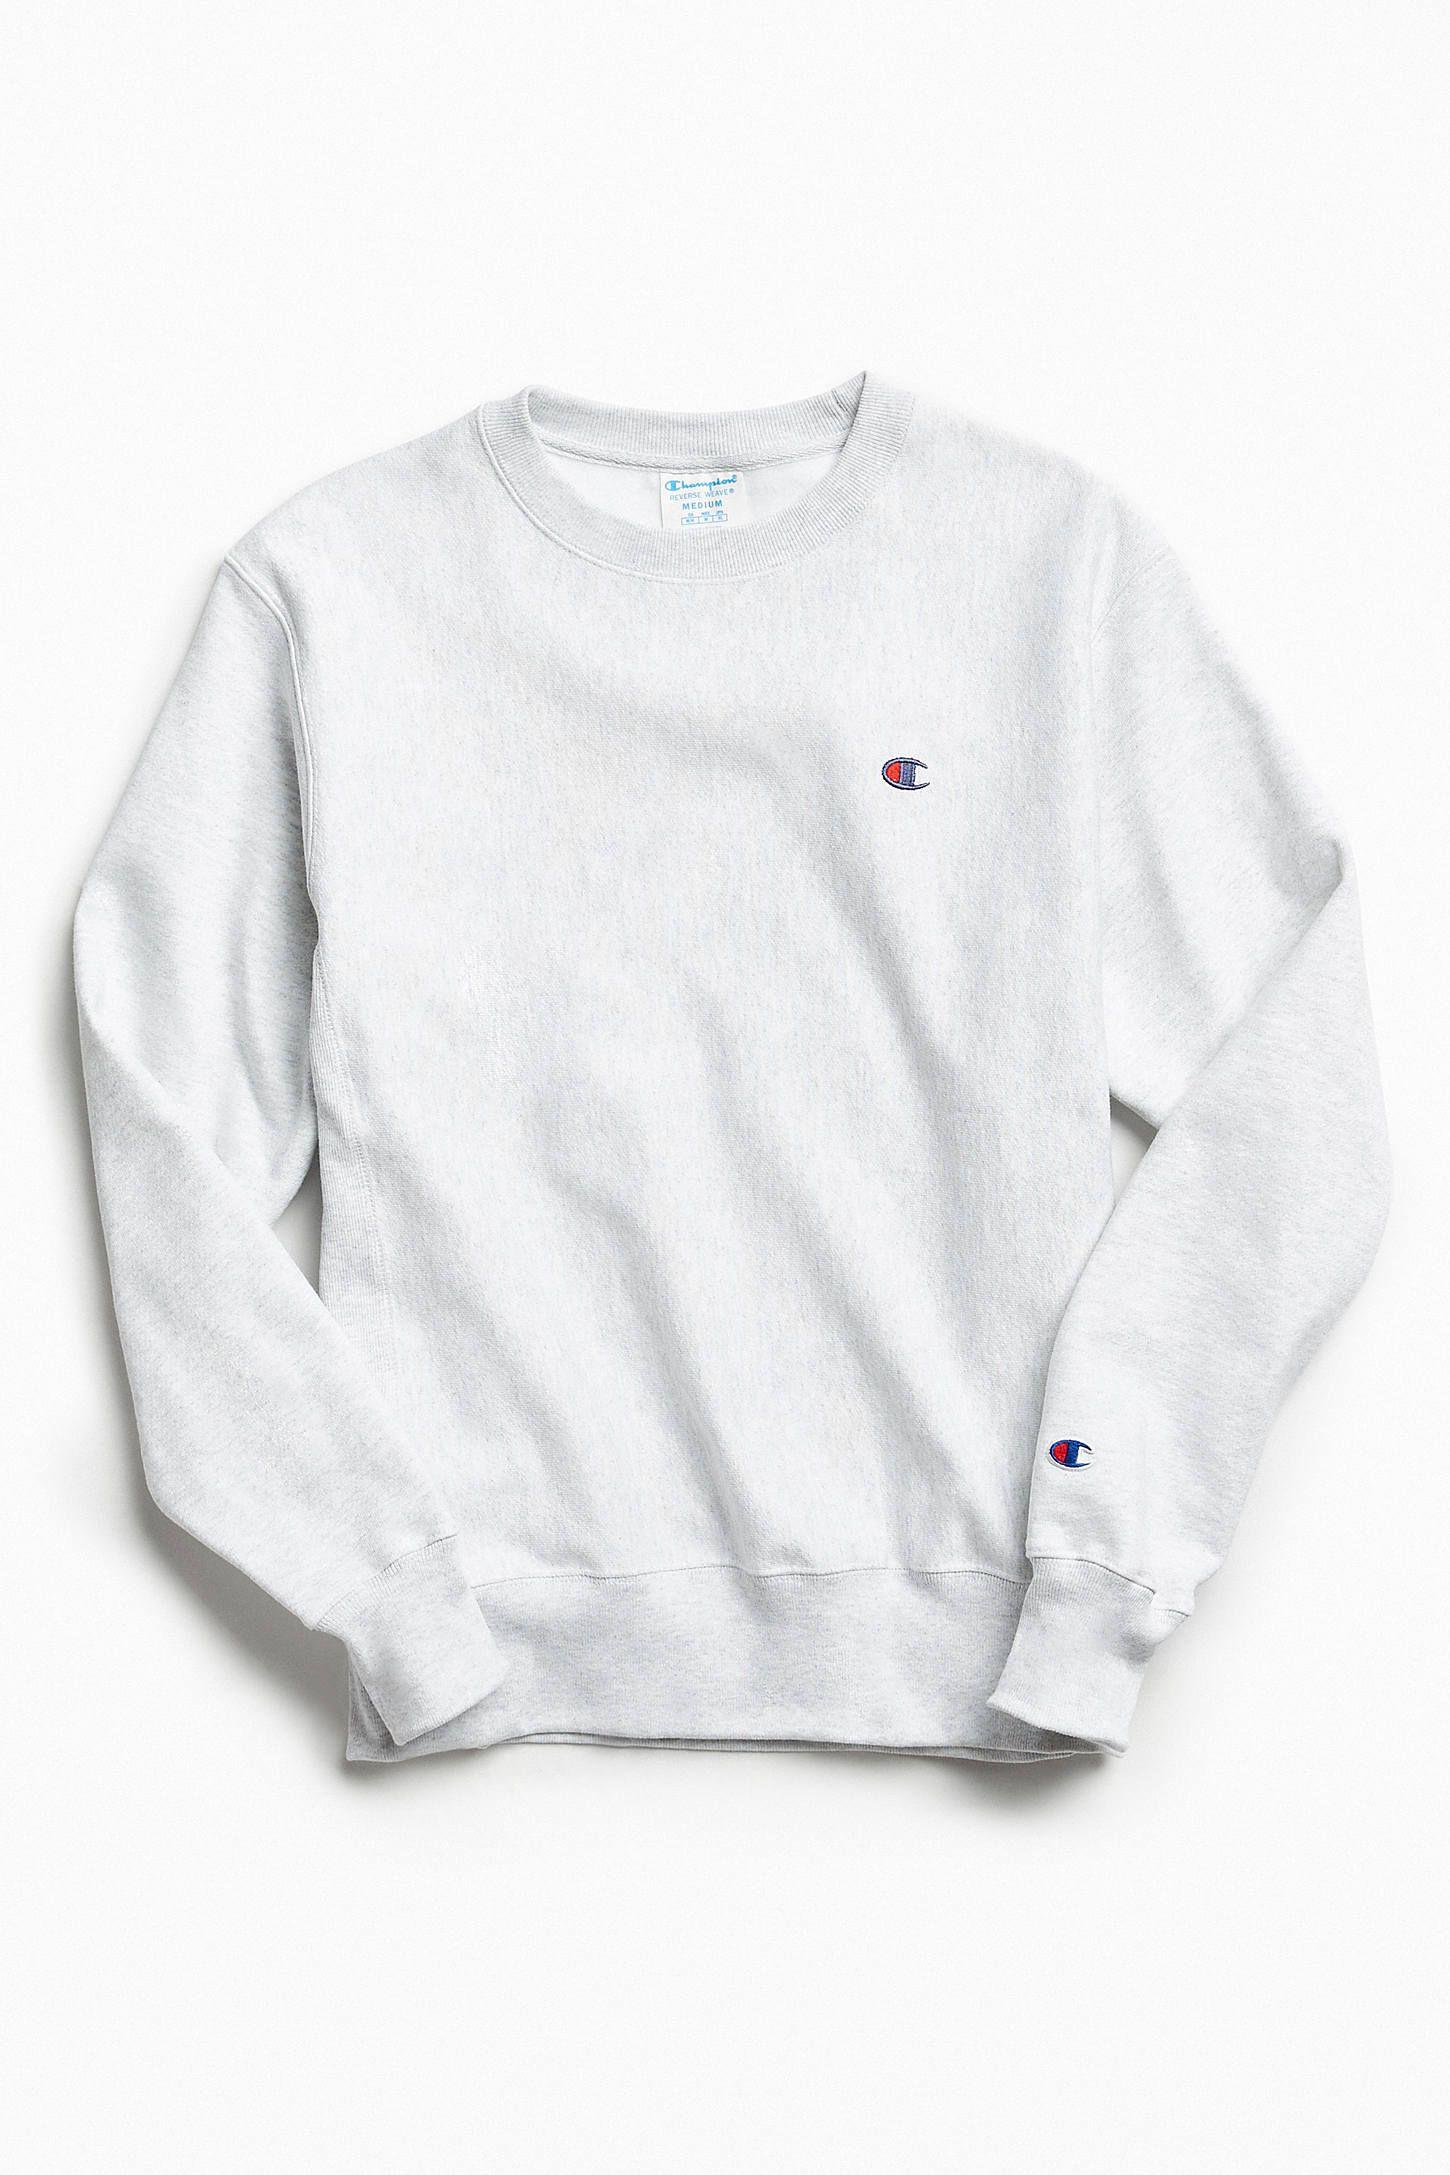 10bd31ffff22 Champion Reverse Weave Fleece Crew Neck Sweatshirt in 2019